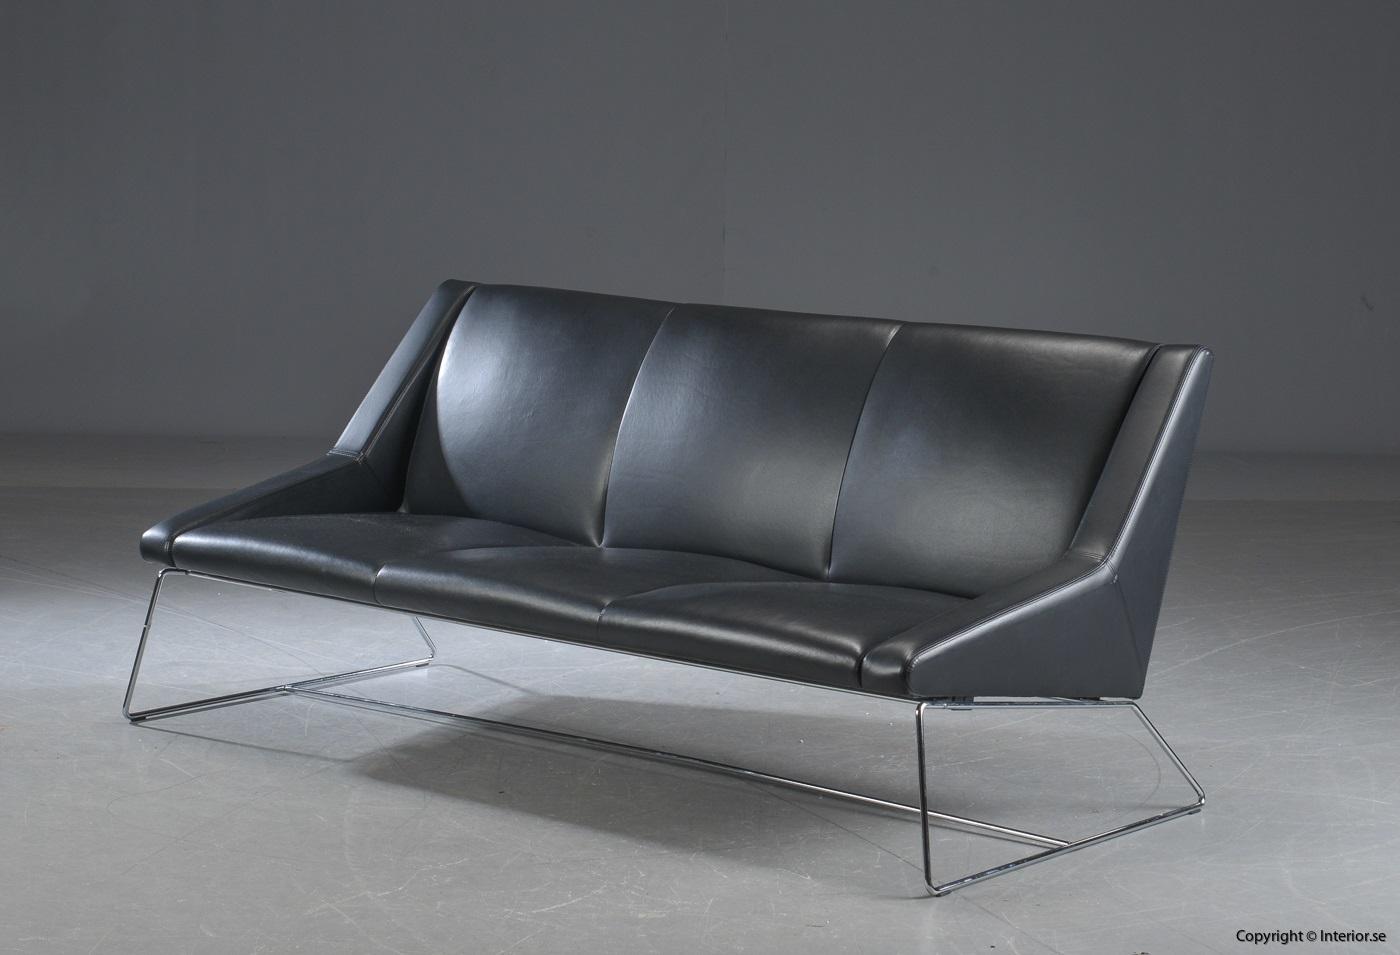 1 Sofa group, Swedese Gran Turismo - Mårten Claesson